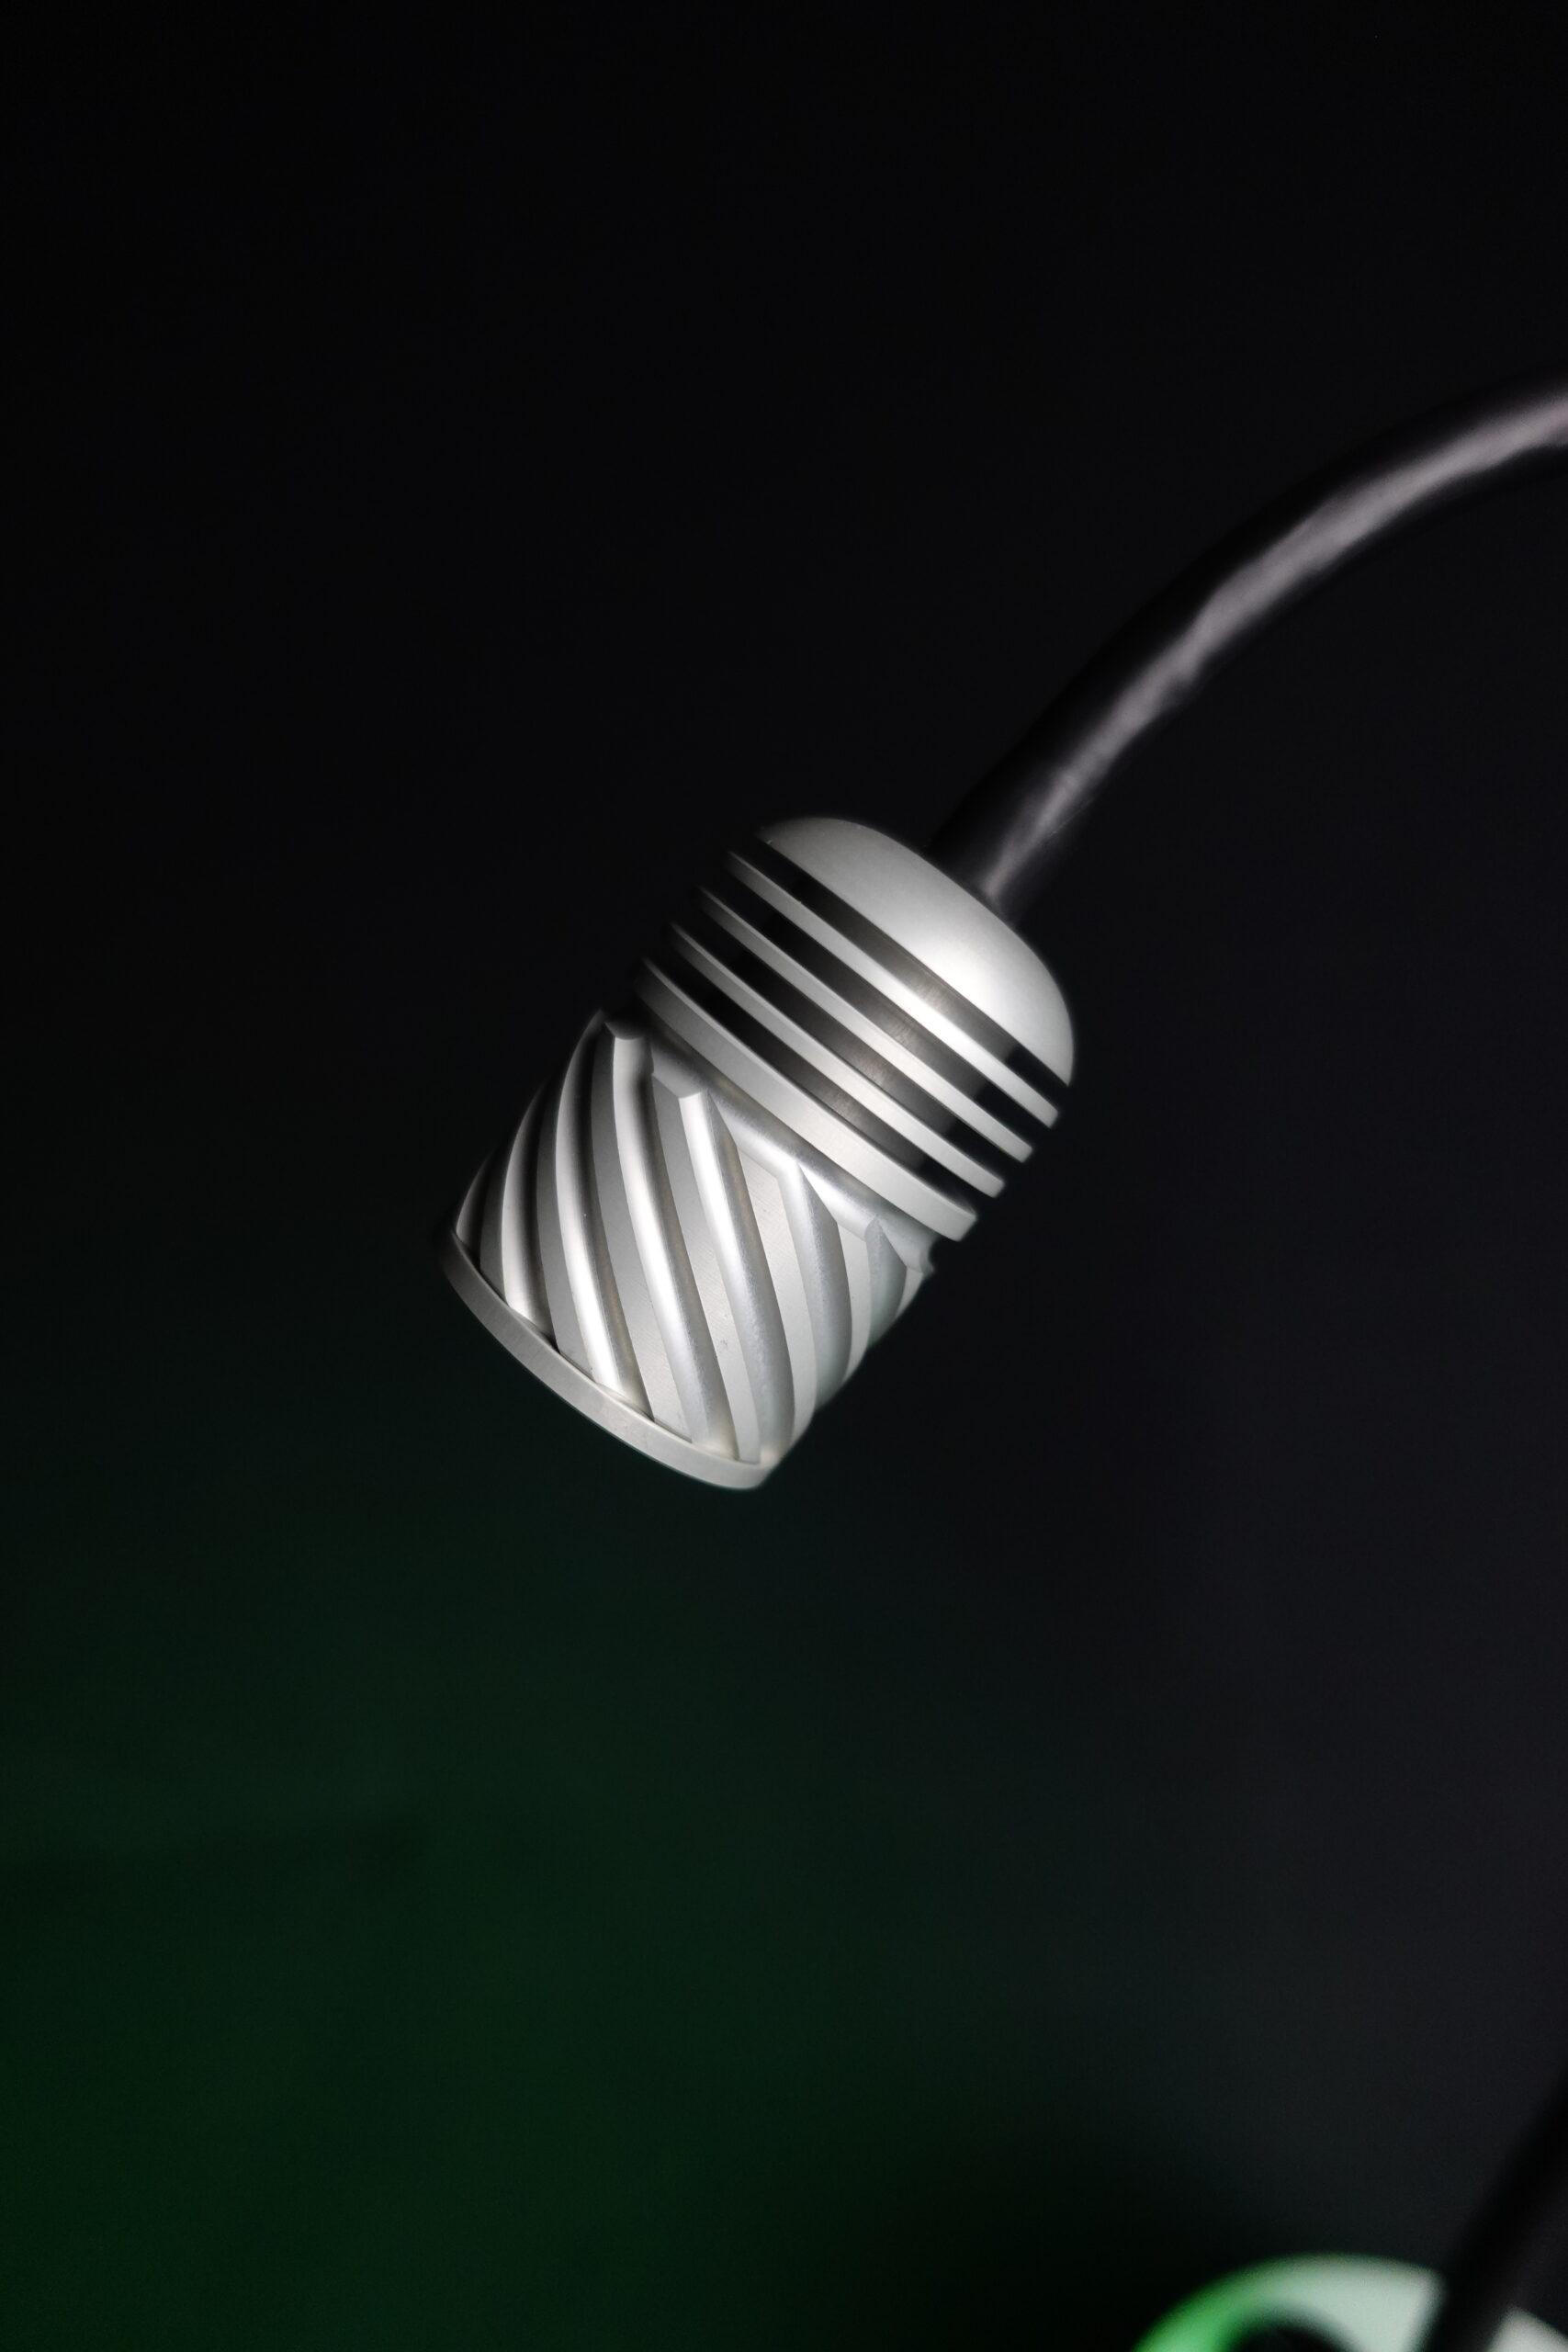 Inspection Lamp 5 Watt Head